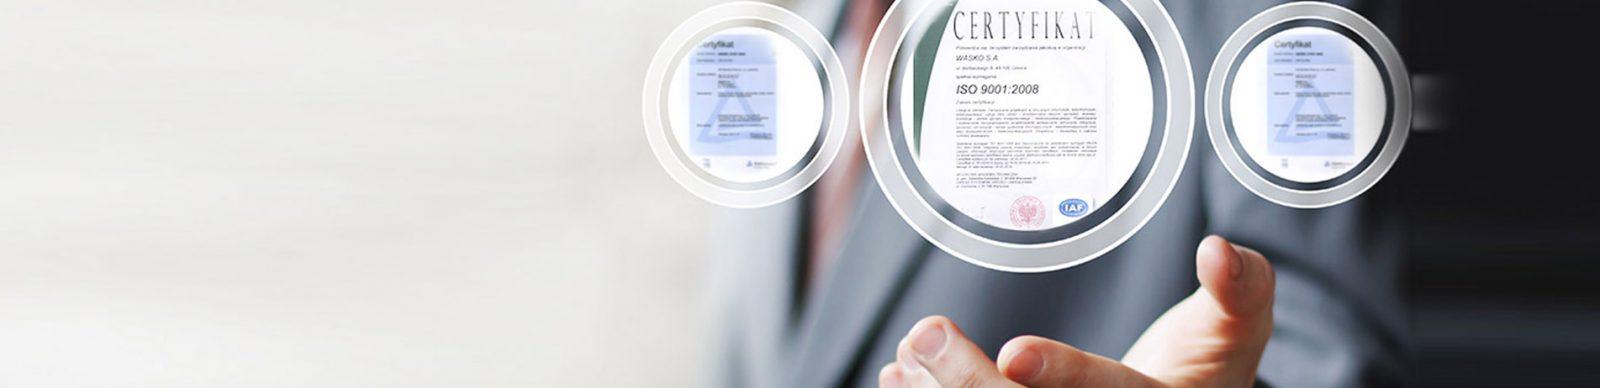 Certyfikaty_heder